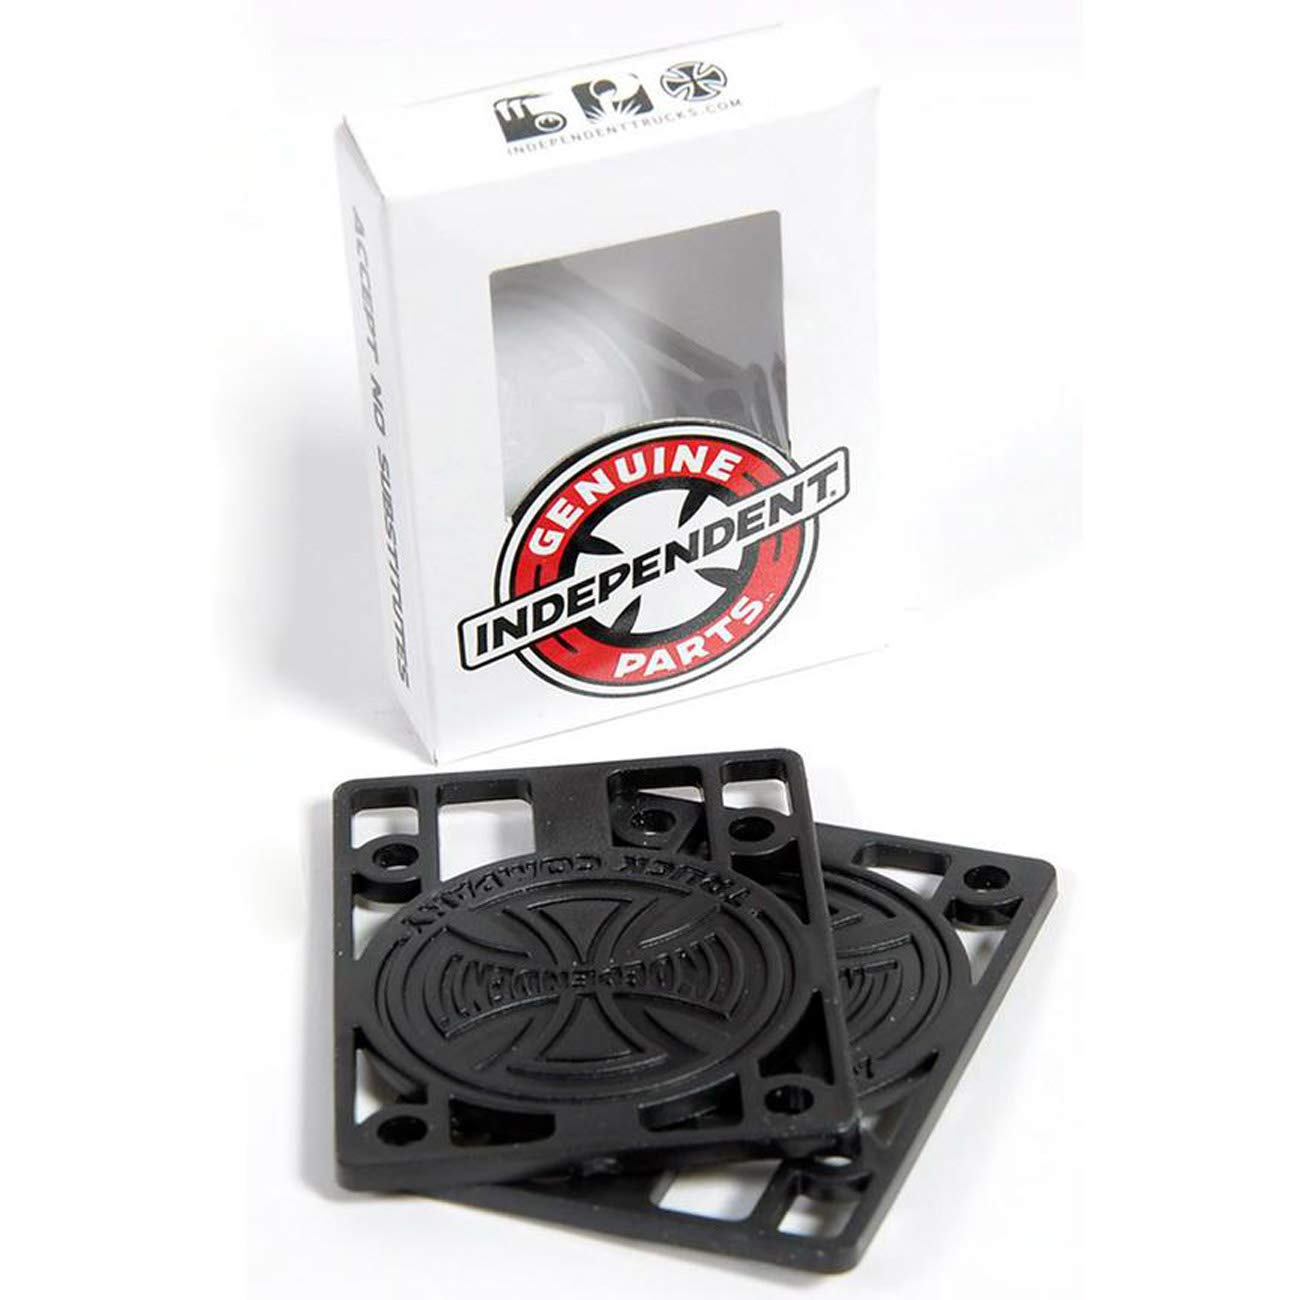 Independent Genuine Parts Skateboard Risers